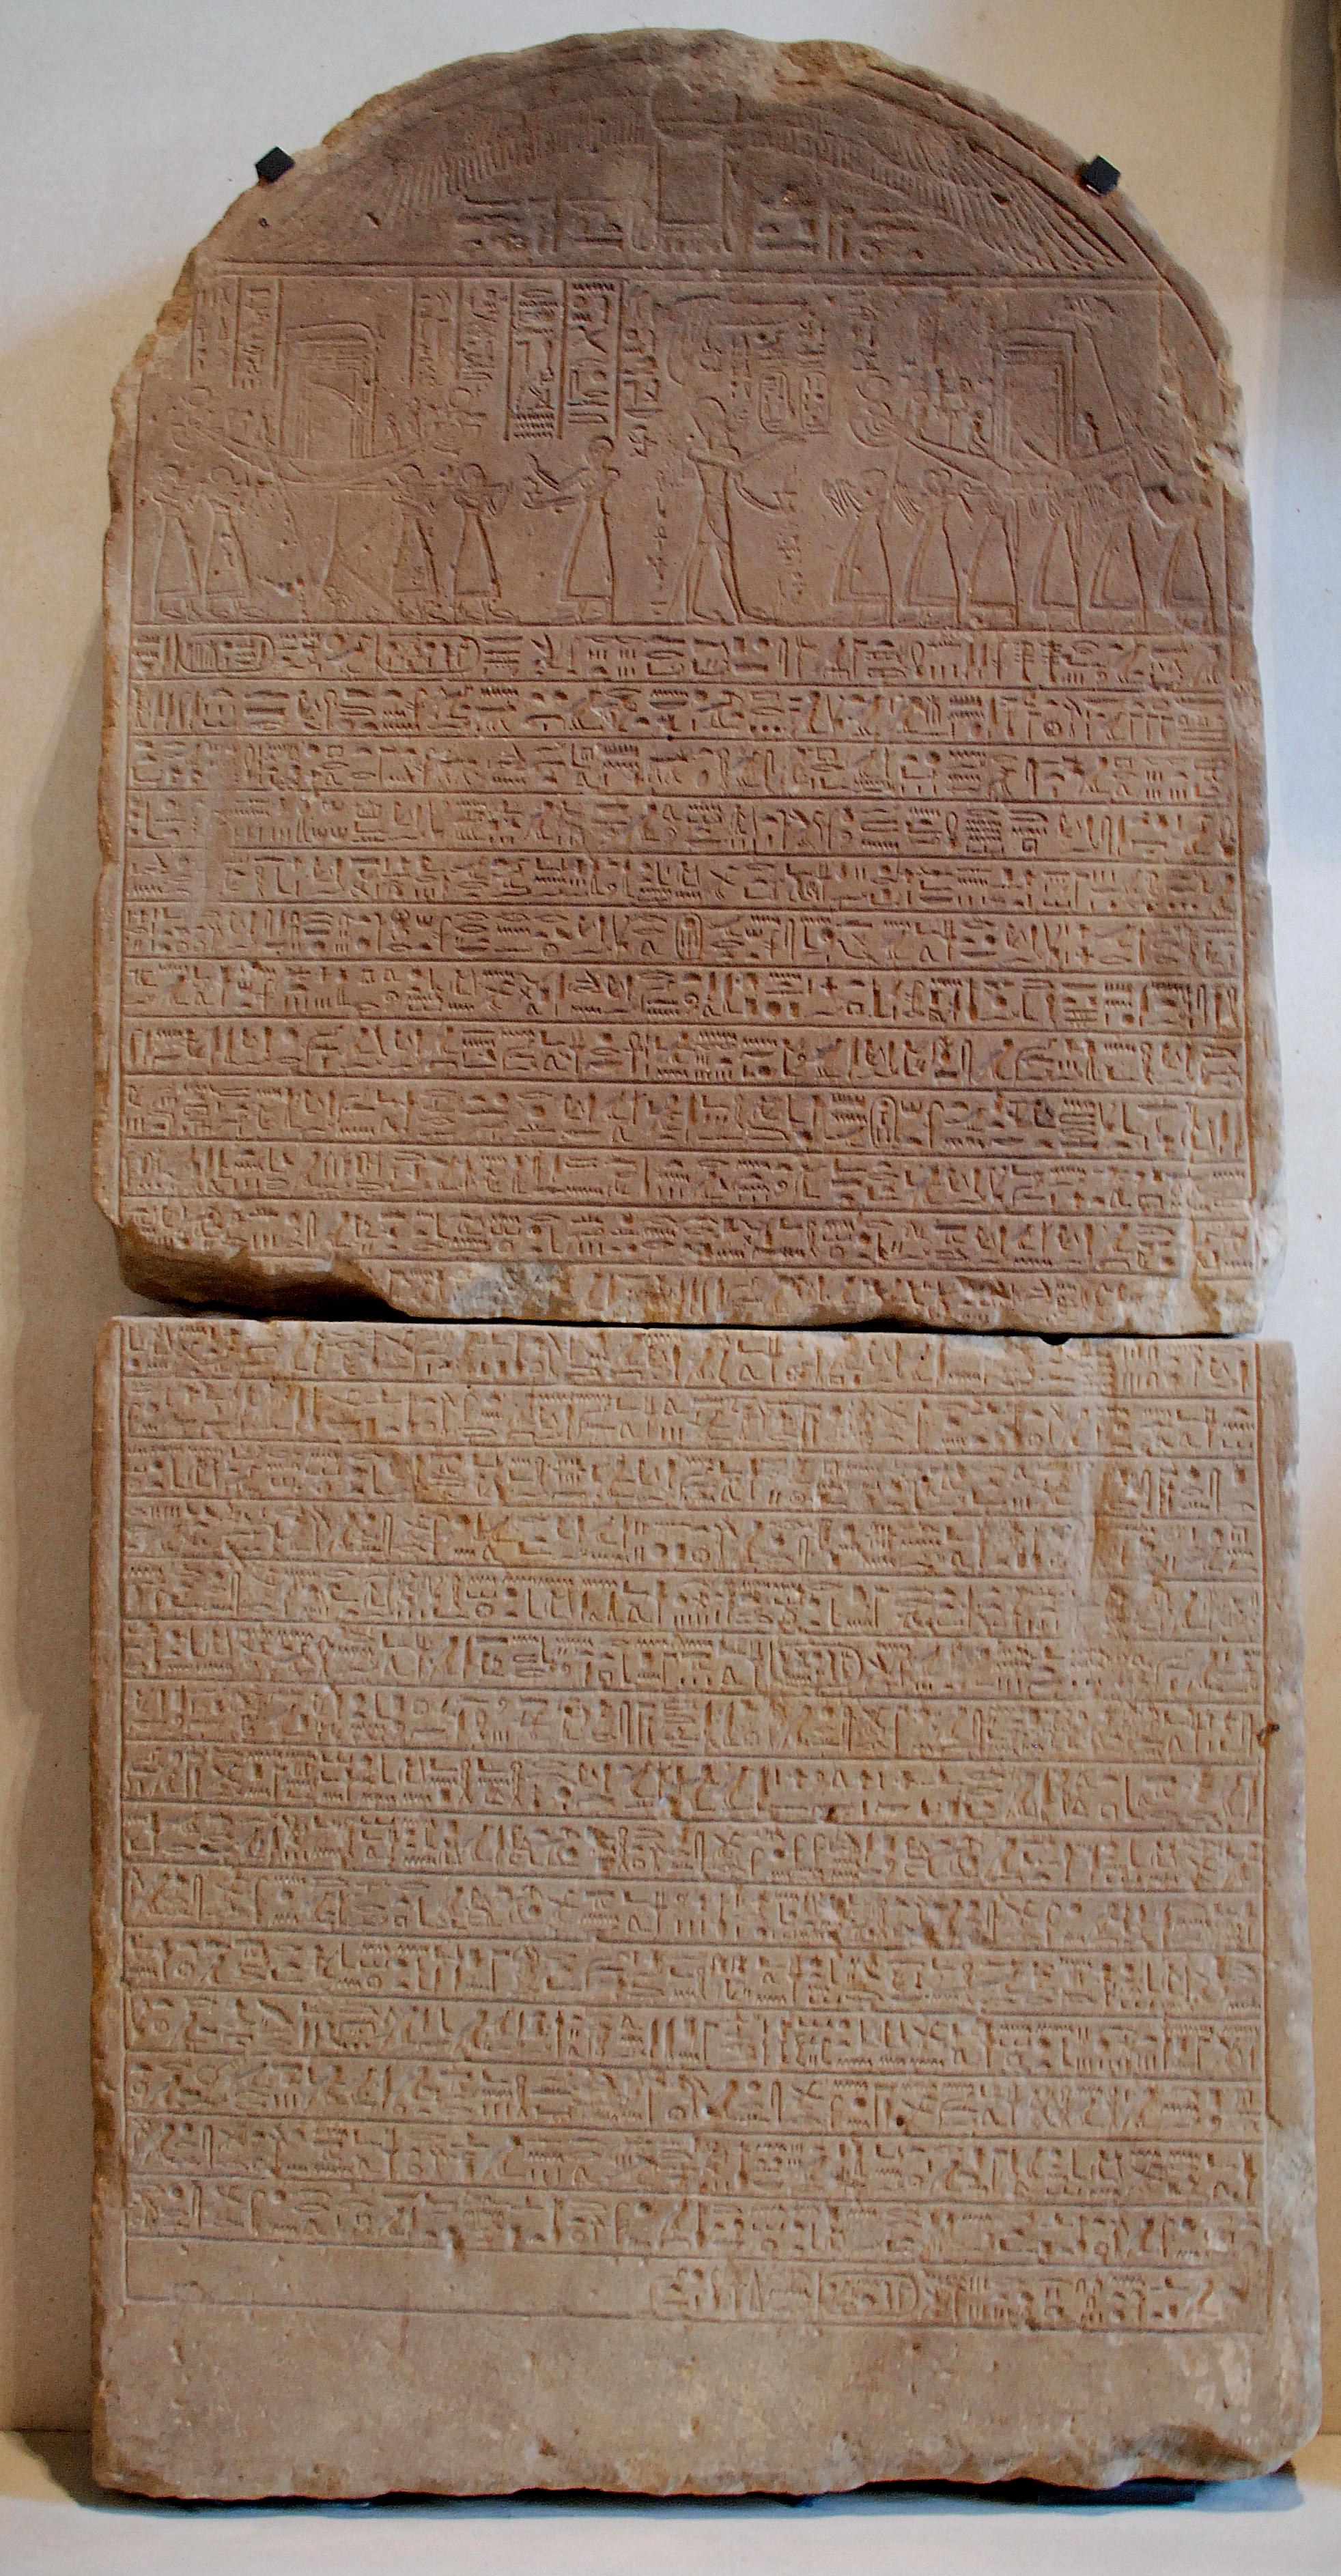 http://upload.wikimedia.org/wikipedia/commons/b/b3/Bakhtan_stele_Louvre.JPG